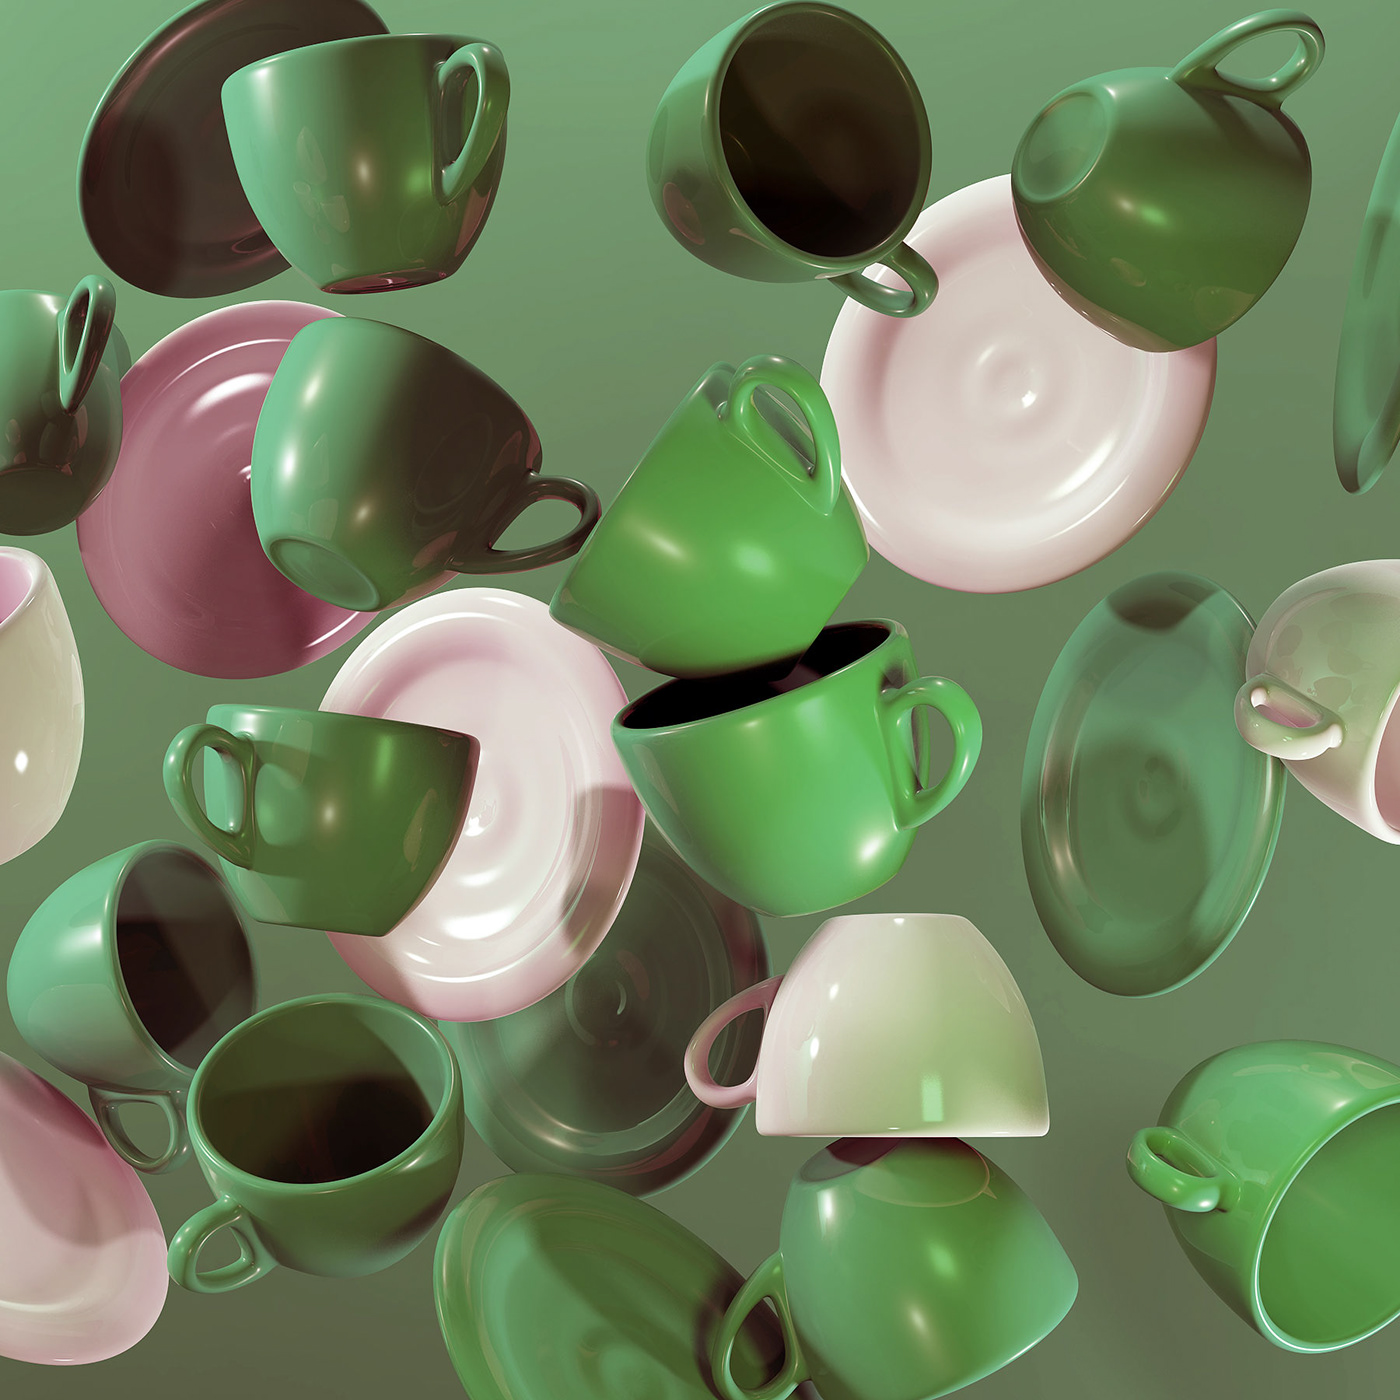 ceramics  hand made 3D art modeling sculpting  rendering latvian yelena yefimova clay